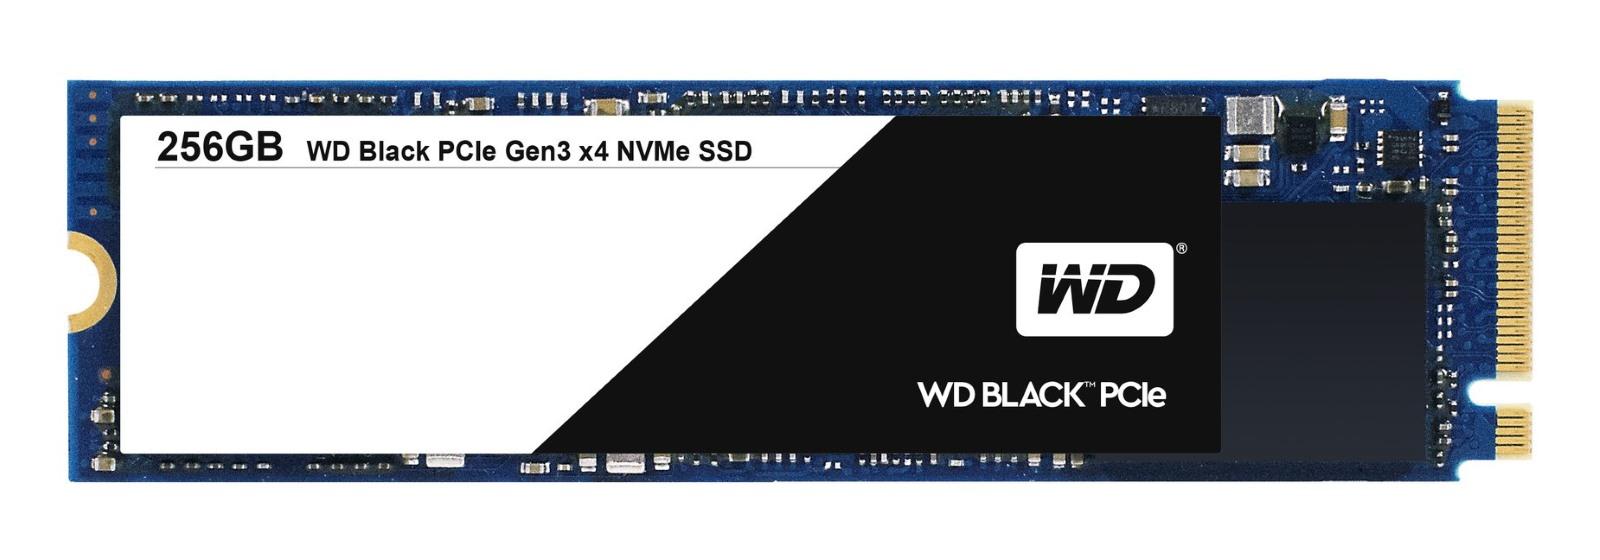 WD Black PCIe SSD (Bild: WD)